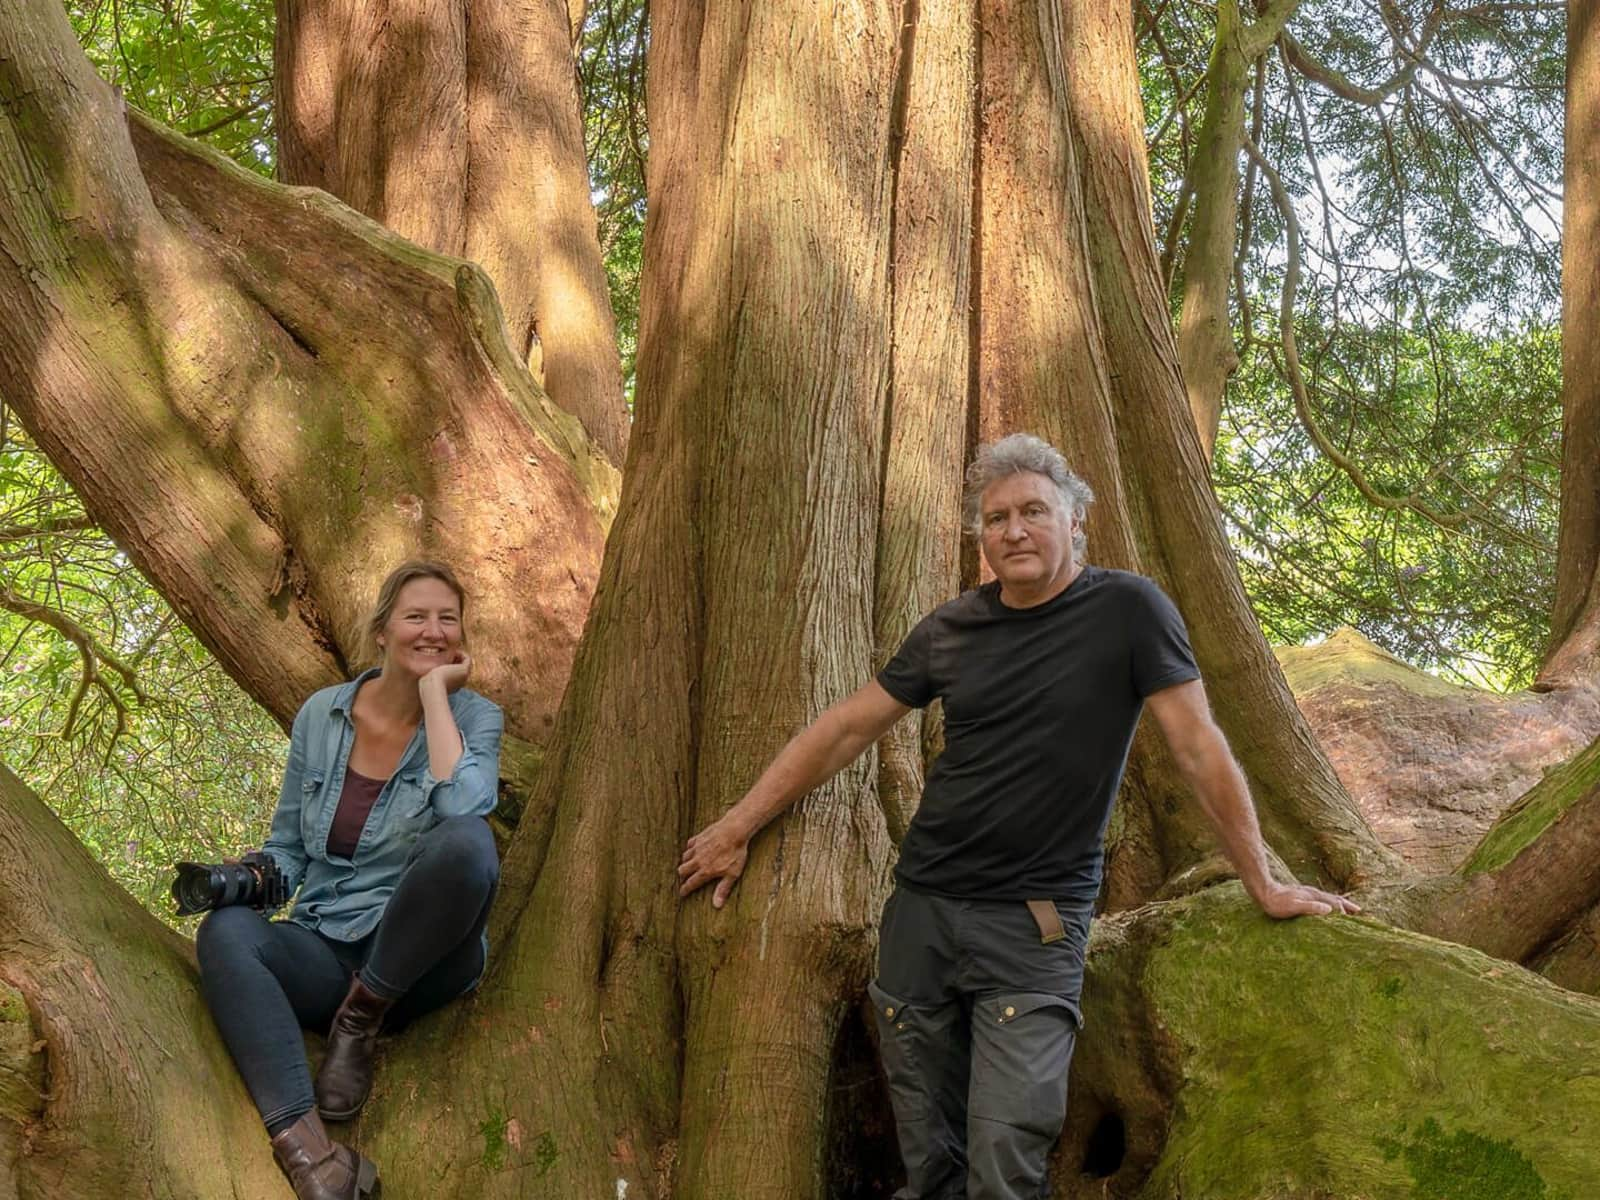 Lars & Annemarie from Lochem, Netherlands